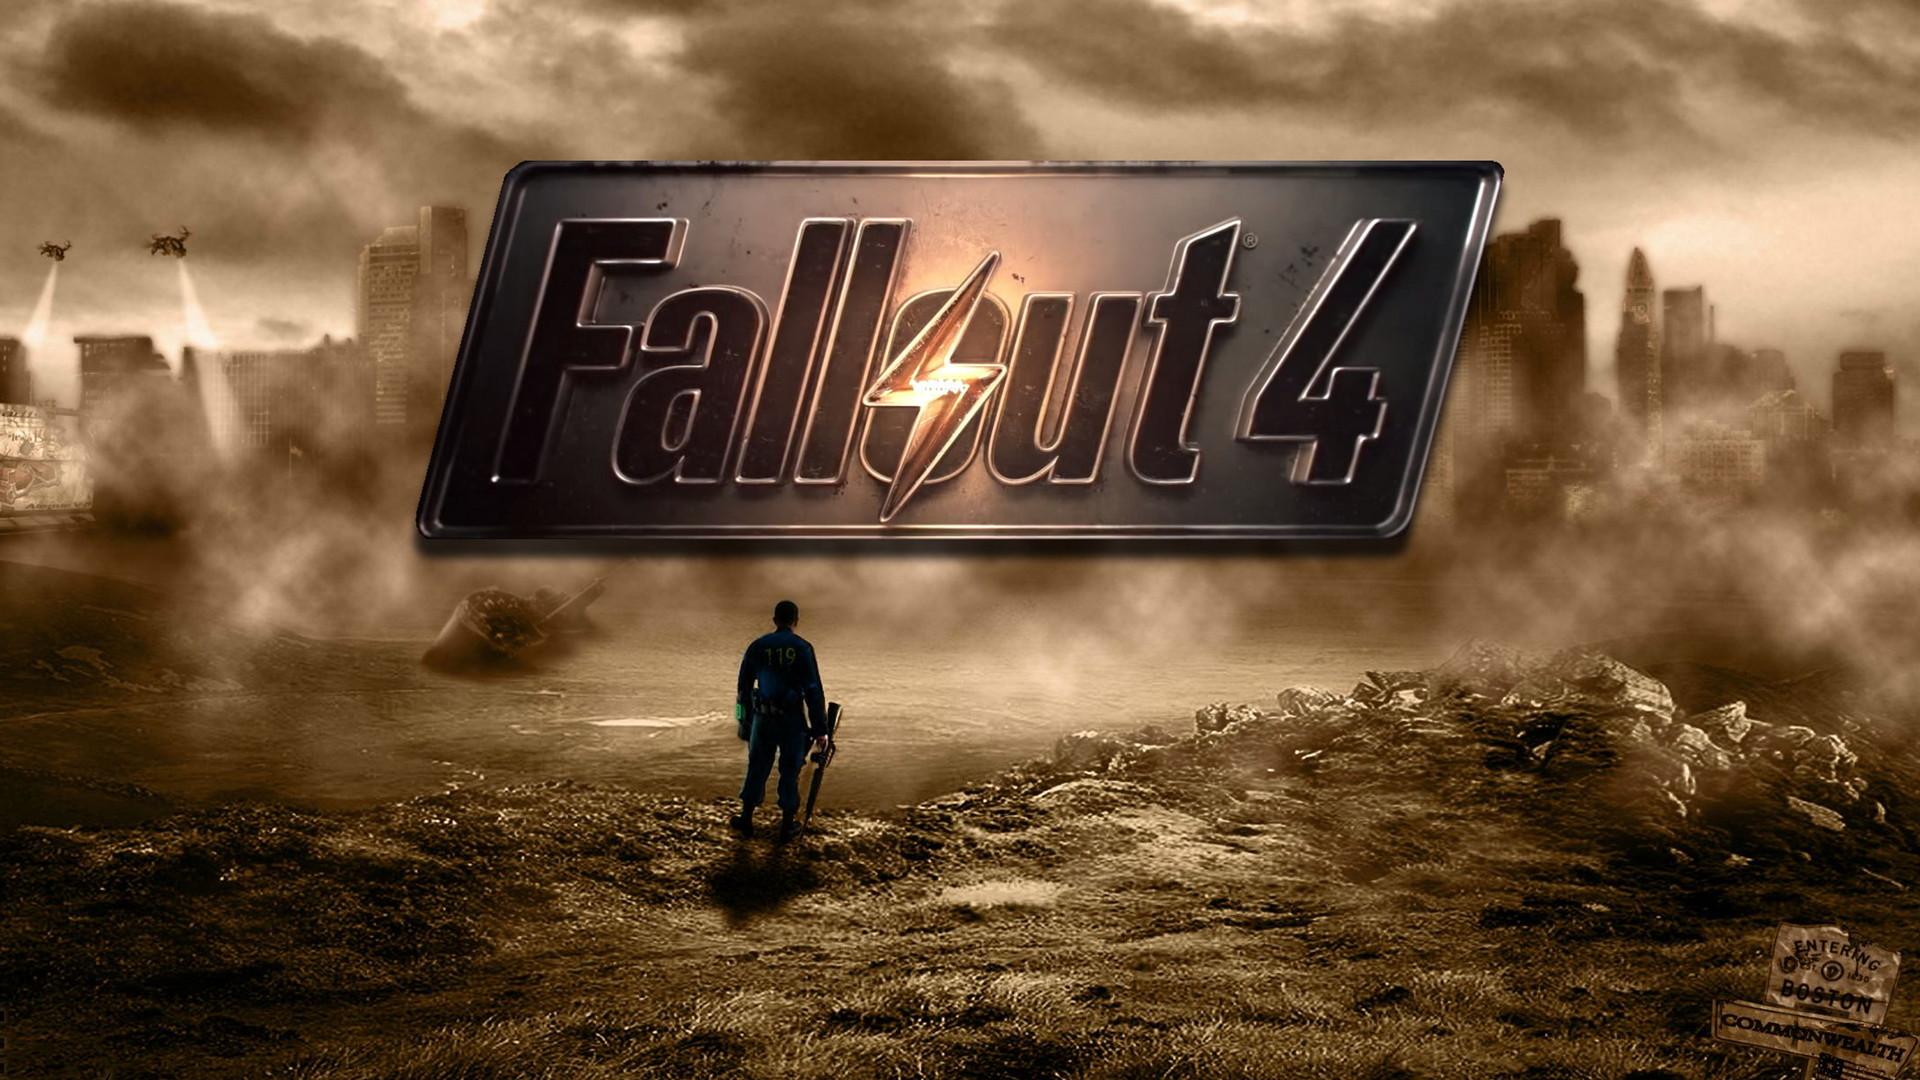 Image – Fallout-4-Wallpaper-HD-Resolution-b7VB5.jpg | Fallout Wiki | FANDOM  powered by Wikia